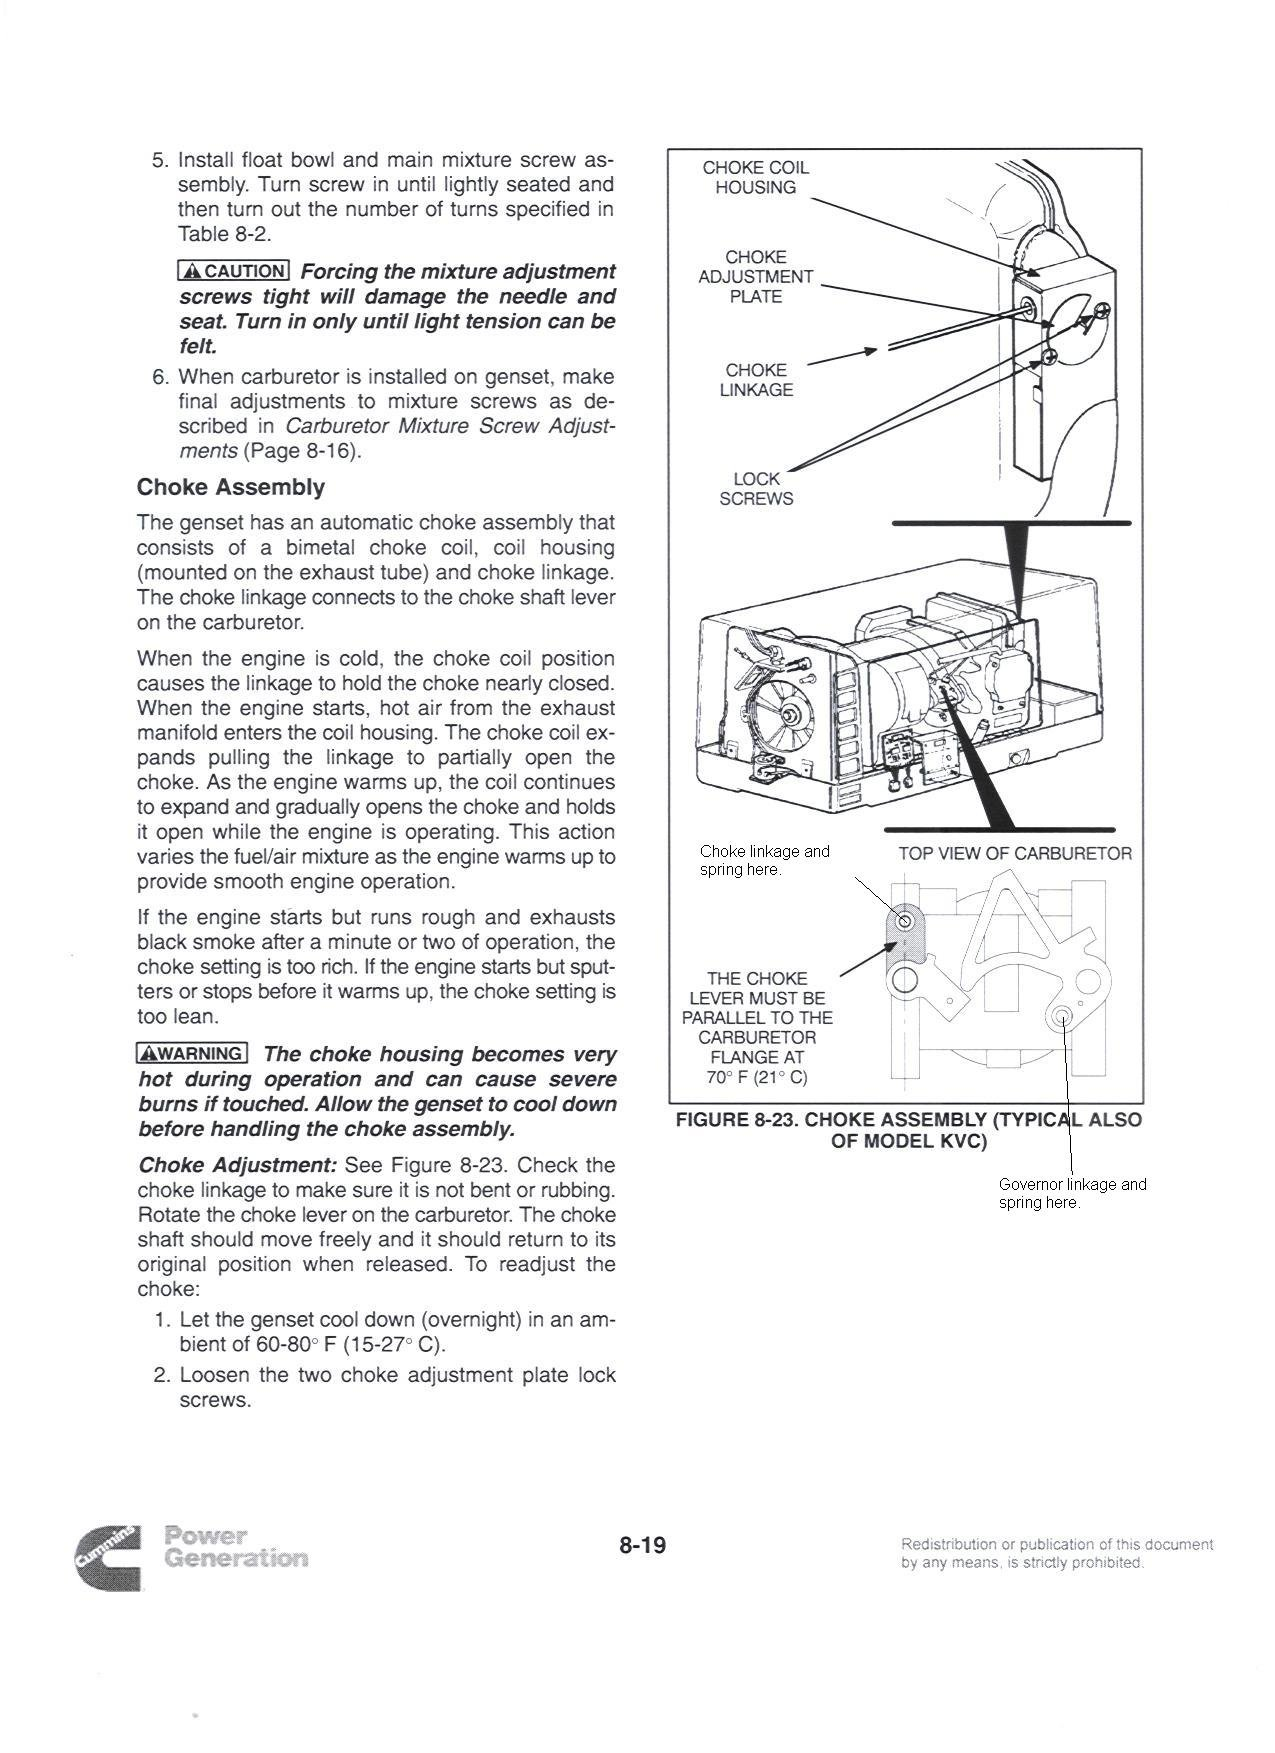 i an onan microlight 2800 generator its had carburetor